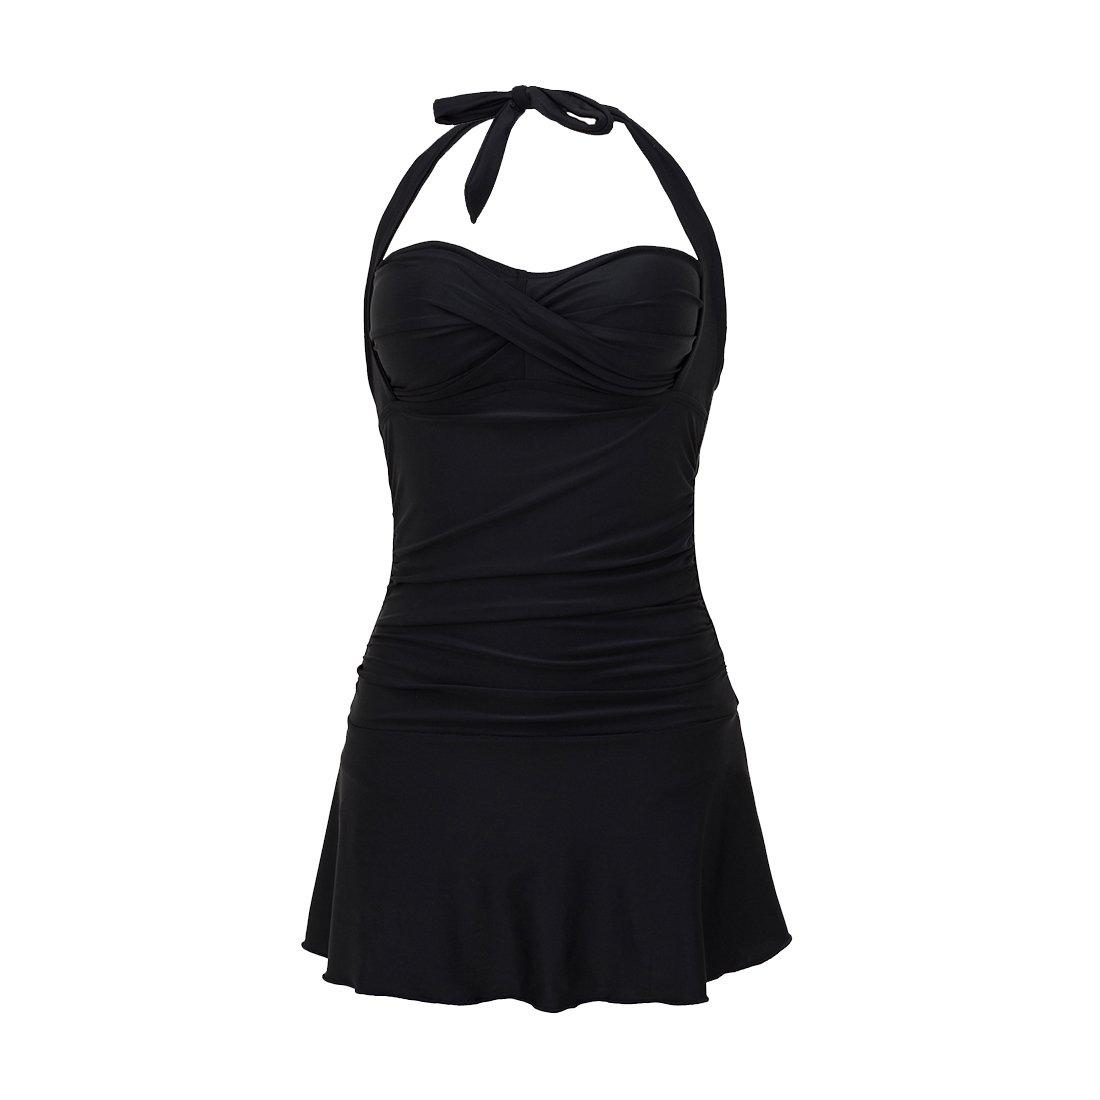 MEATFLY.Women's Skirted Swimdress One Piece Swimsuit Bathing Suit Swimwear (Black, US 8-10=Tag Size L)